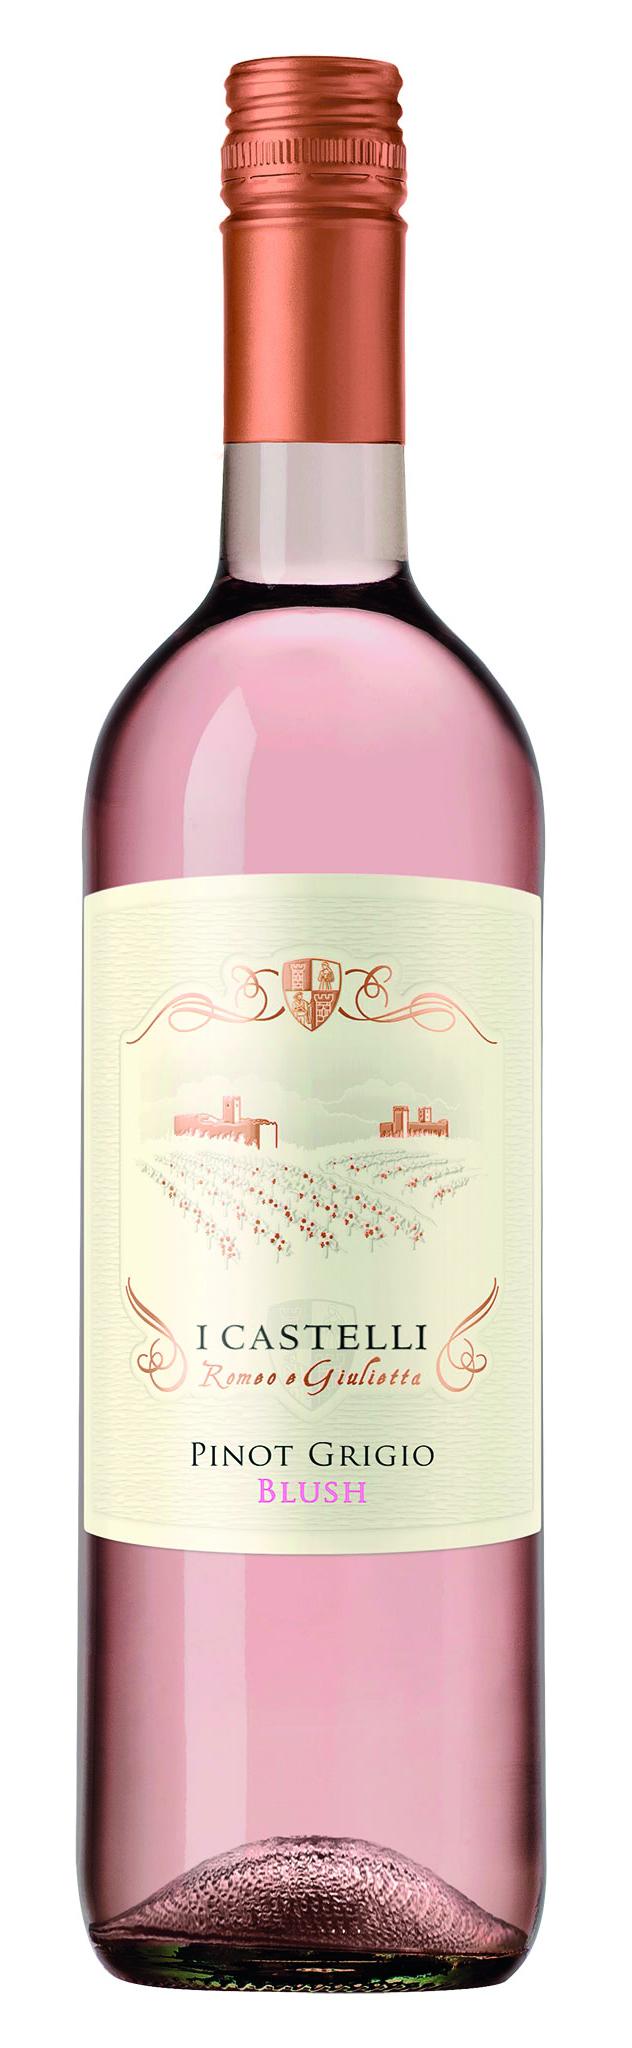 I Castelli Pinot Grigio Blush DOC 75cl